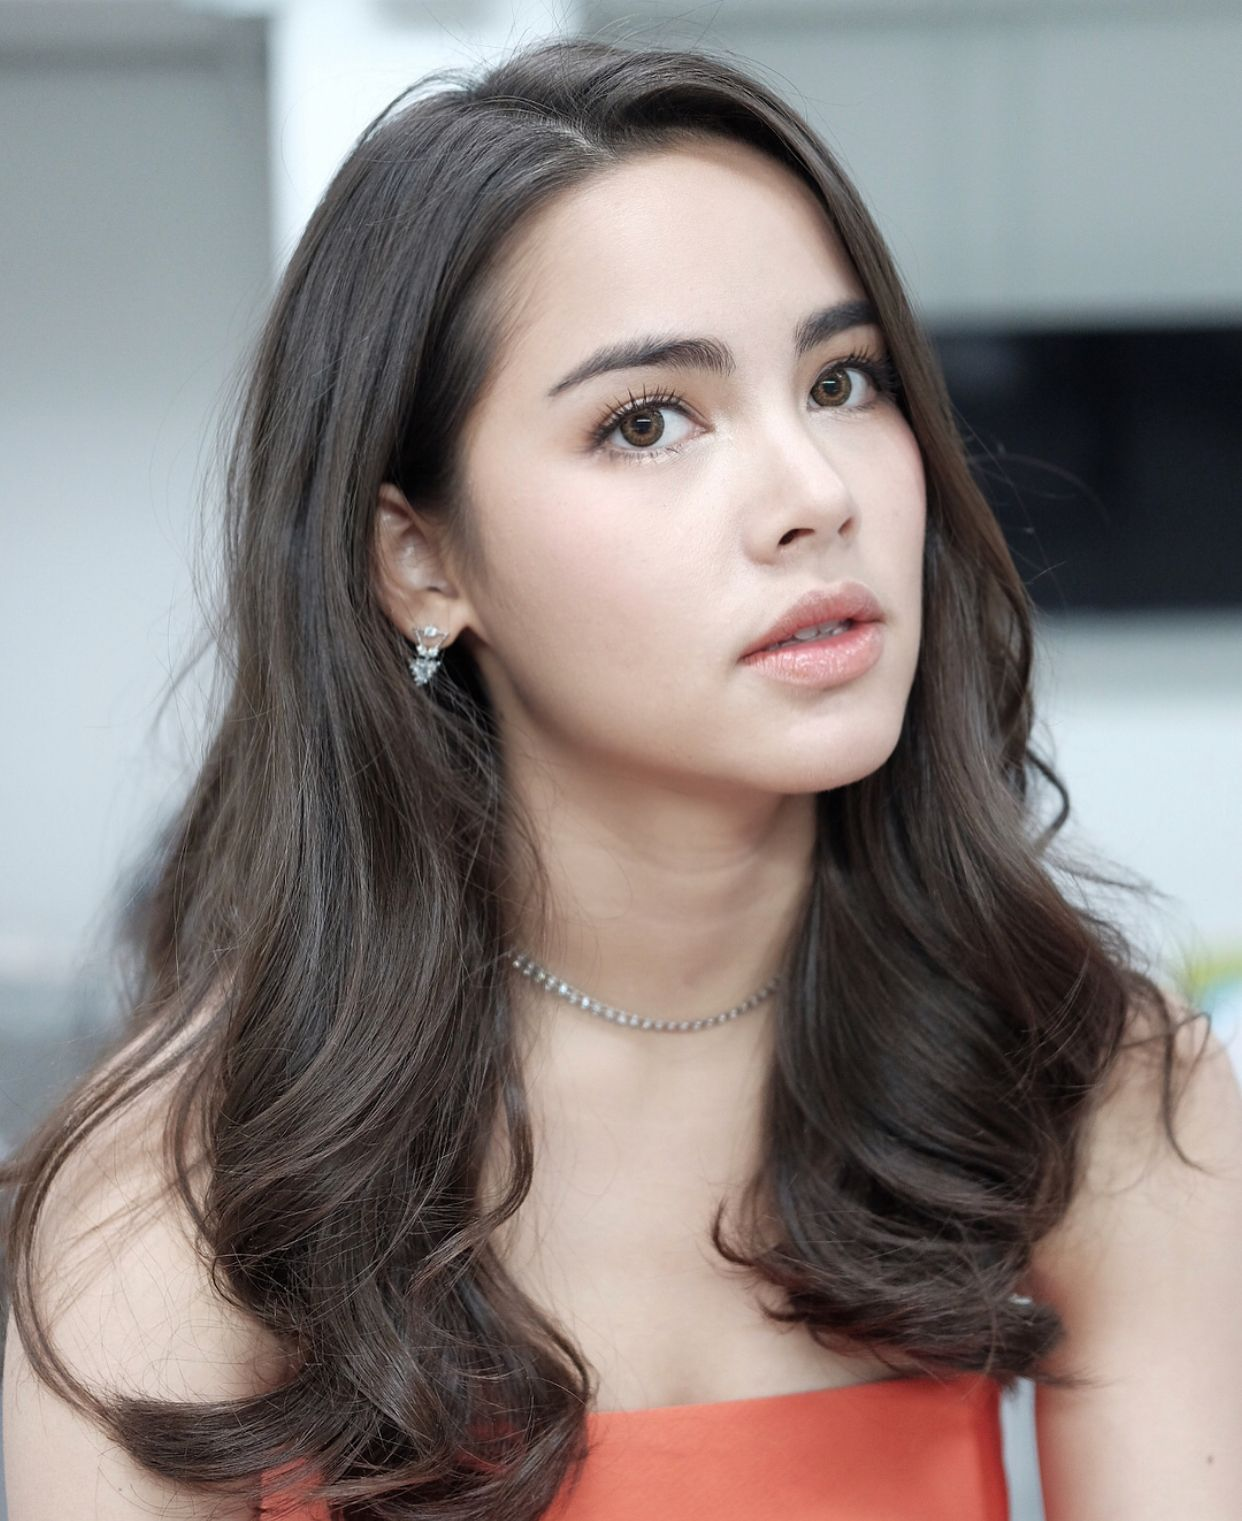 Urassaya Sperbund ️ Thaistar Urassayas Barry Yaya